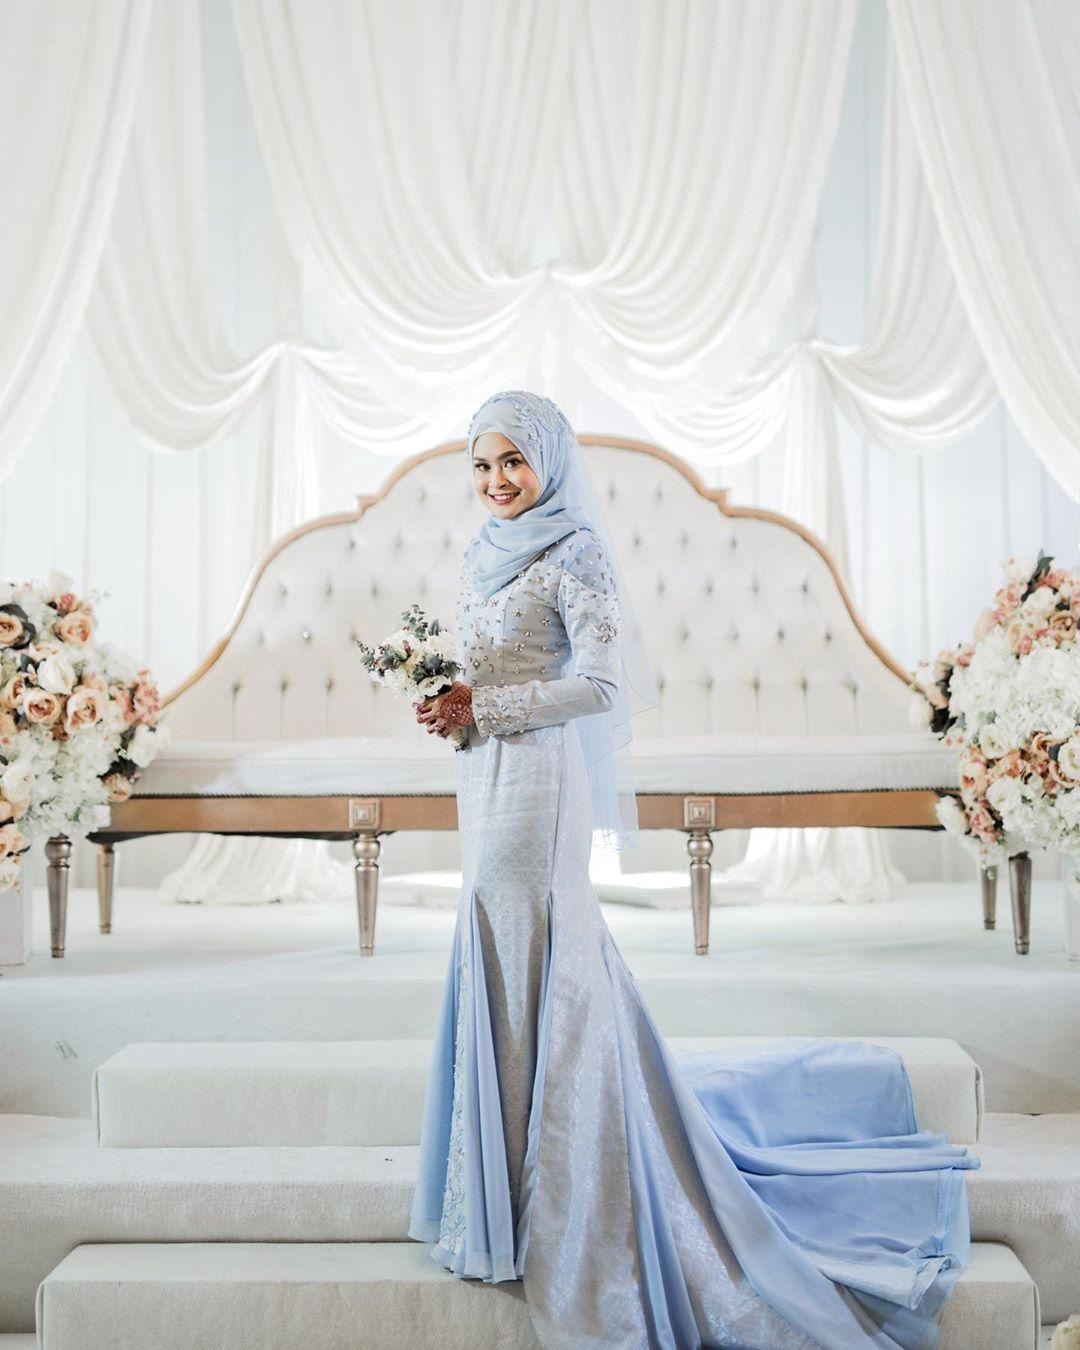 10 Inspirasi Gaun Pengantin Warna Biru yang Nggak Norak